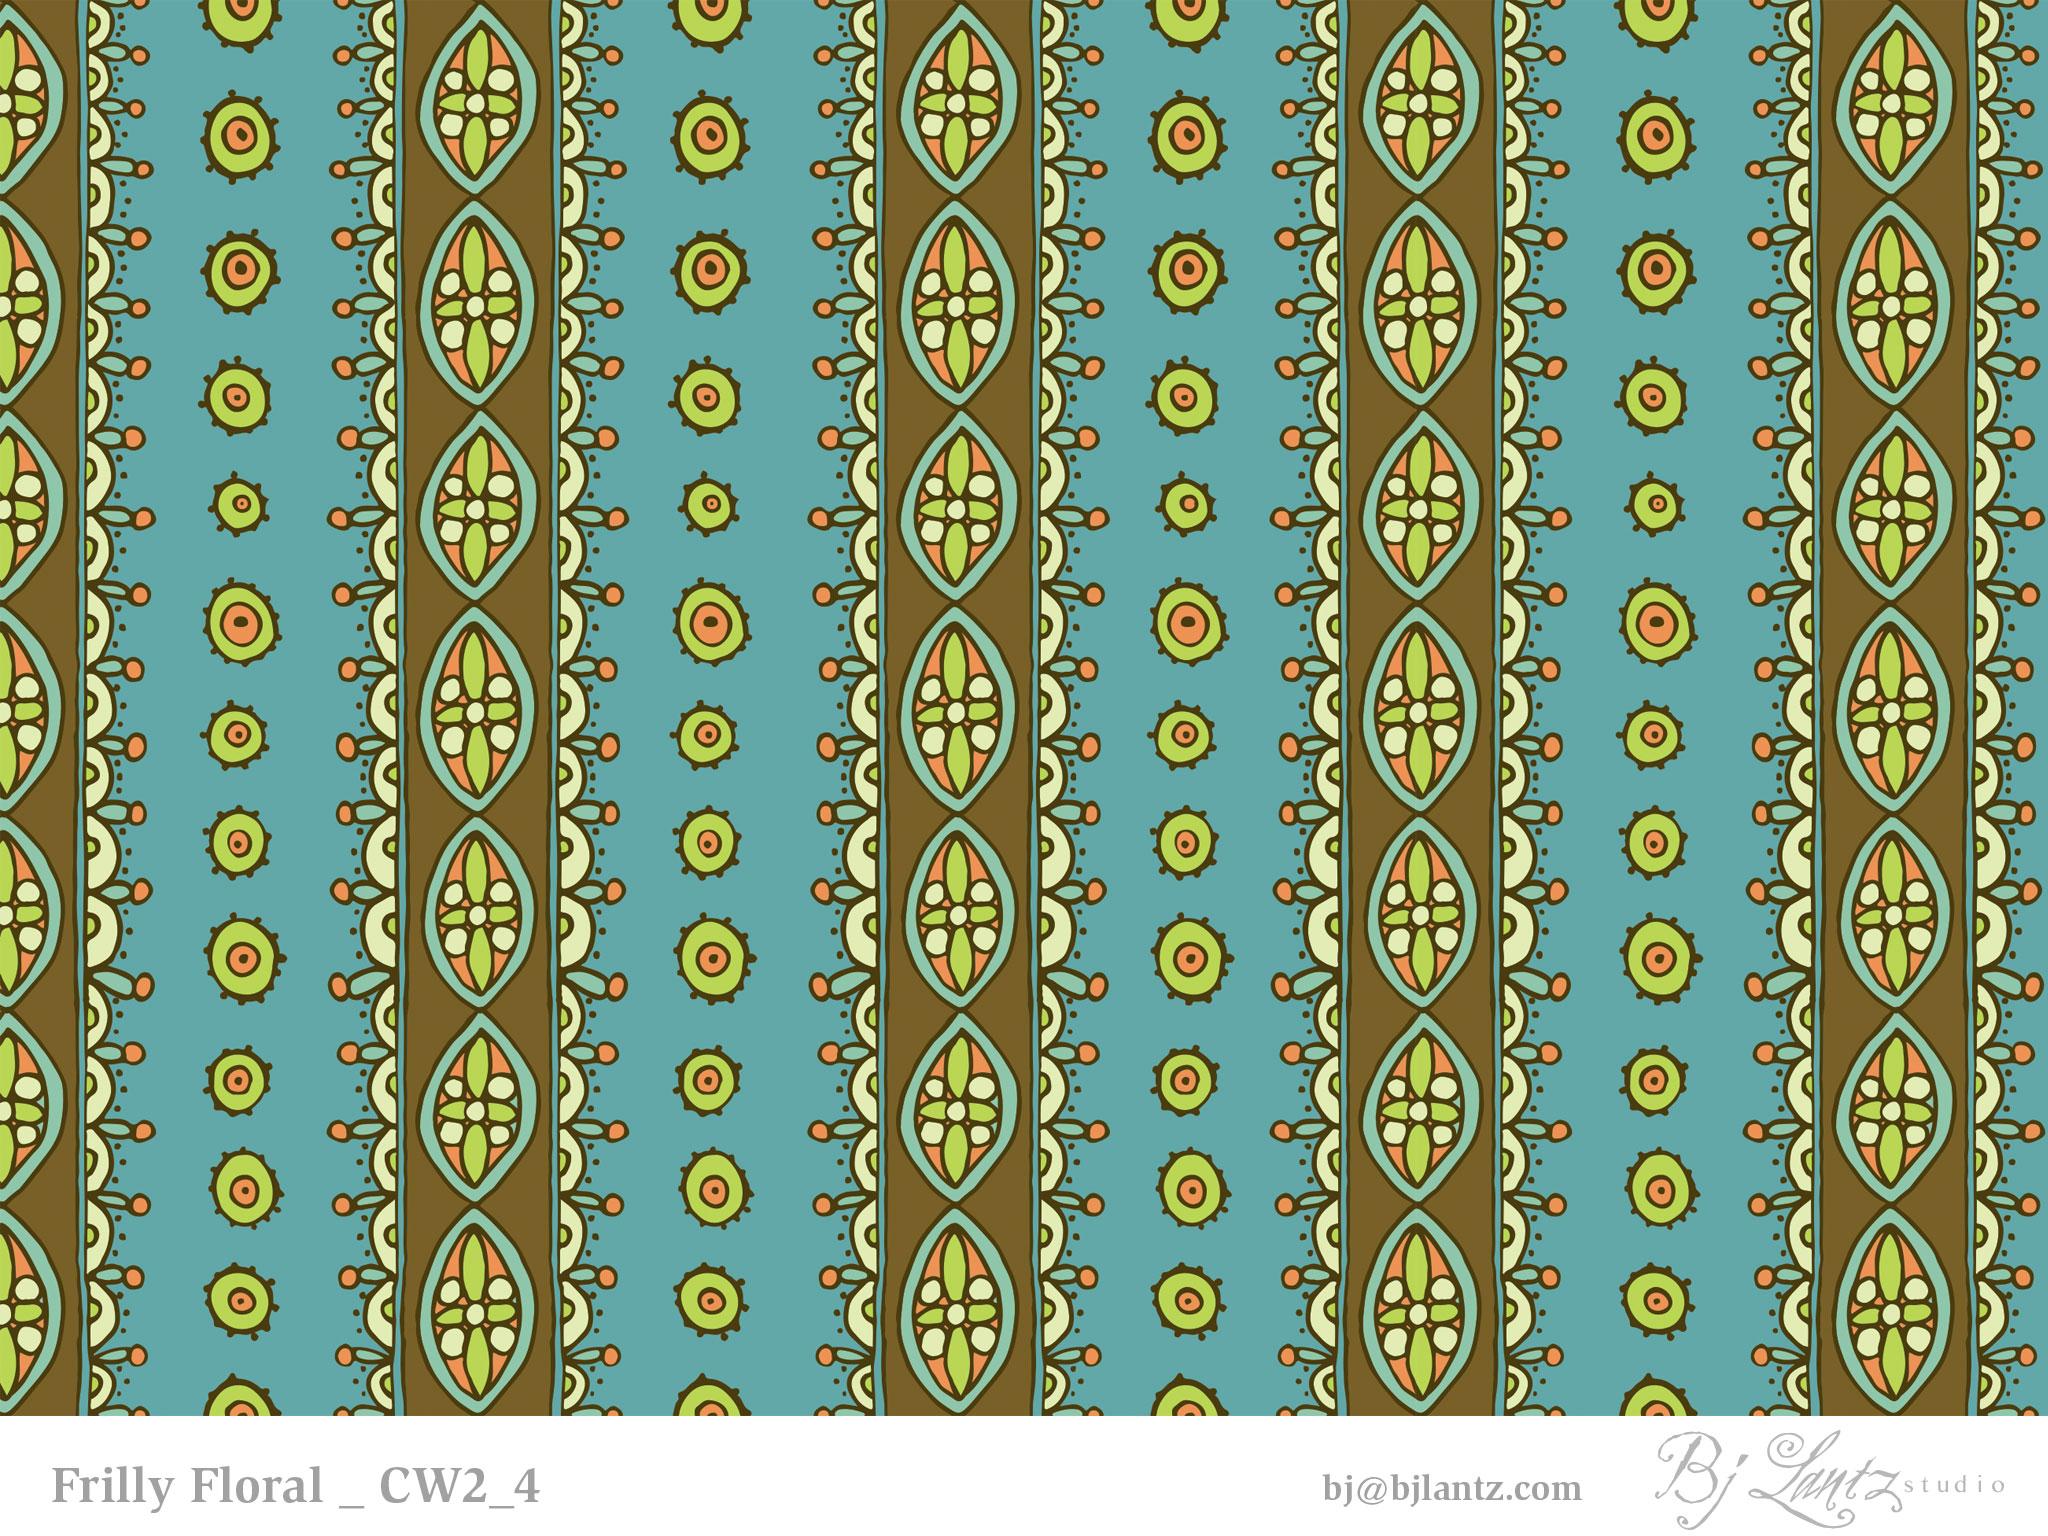 FrillyFloral_CW2_BJ-Lantz_4.jpg